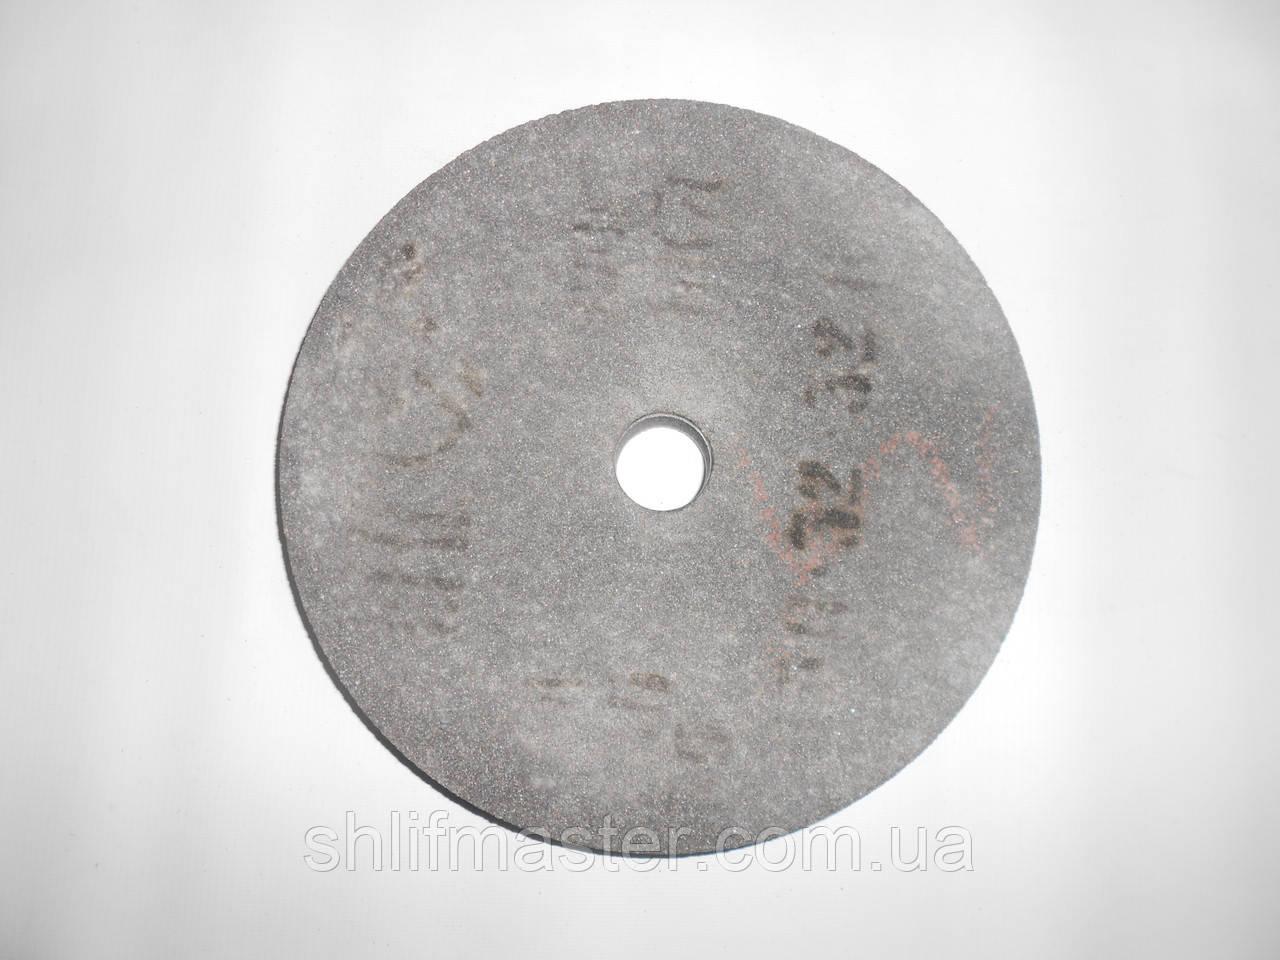 Круг шлифовальный электрокорунд серый керамика 14А ПП 250х32х32 40 СМ,СТ/F40 K, O